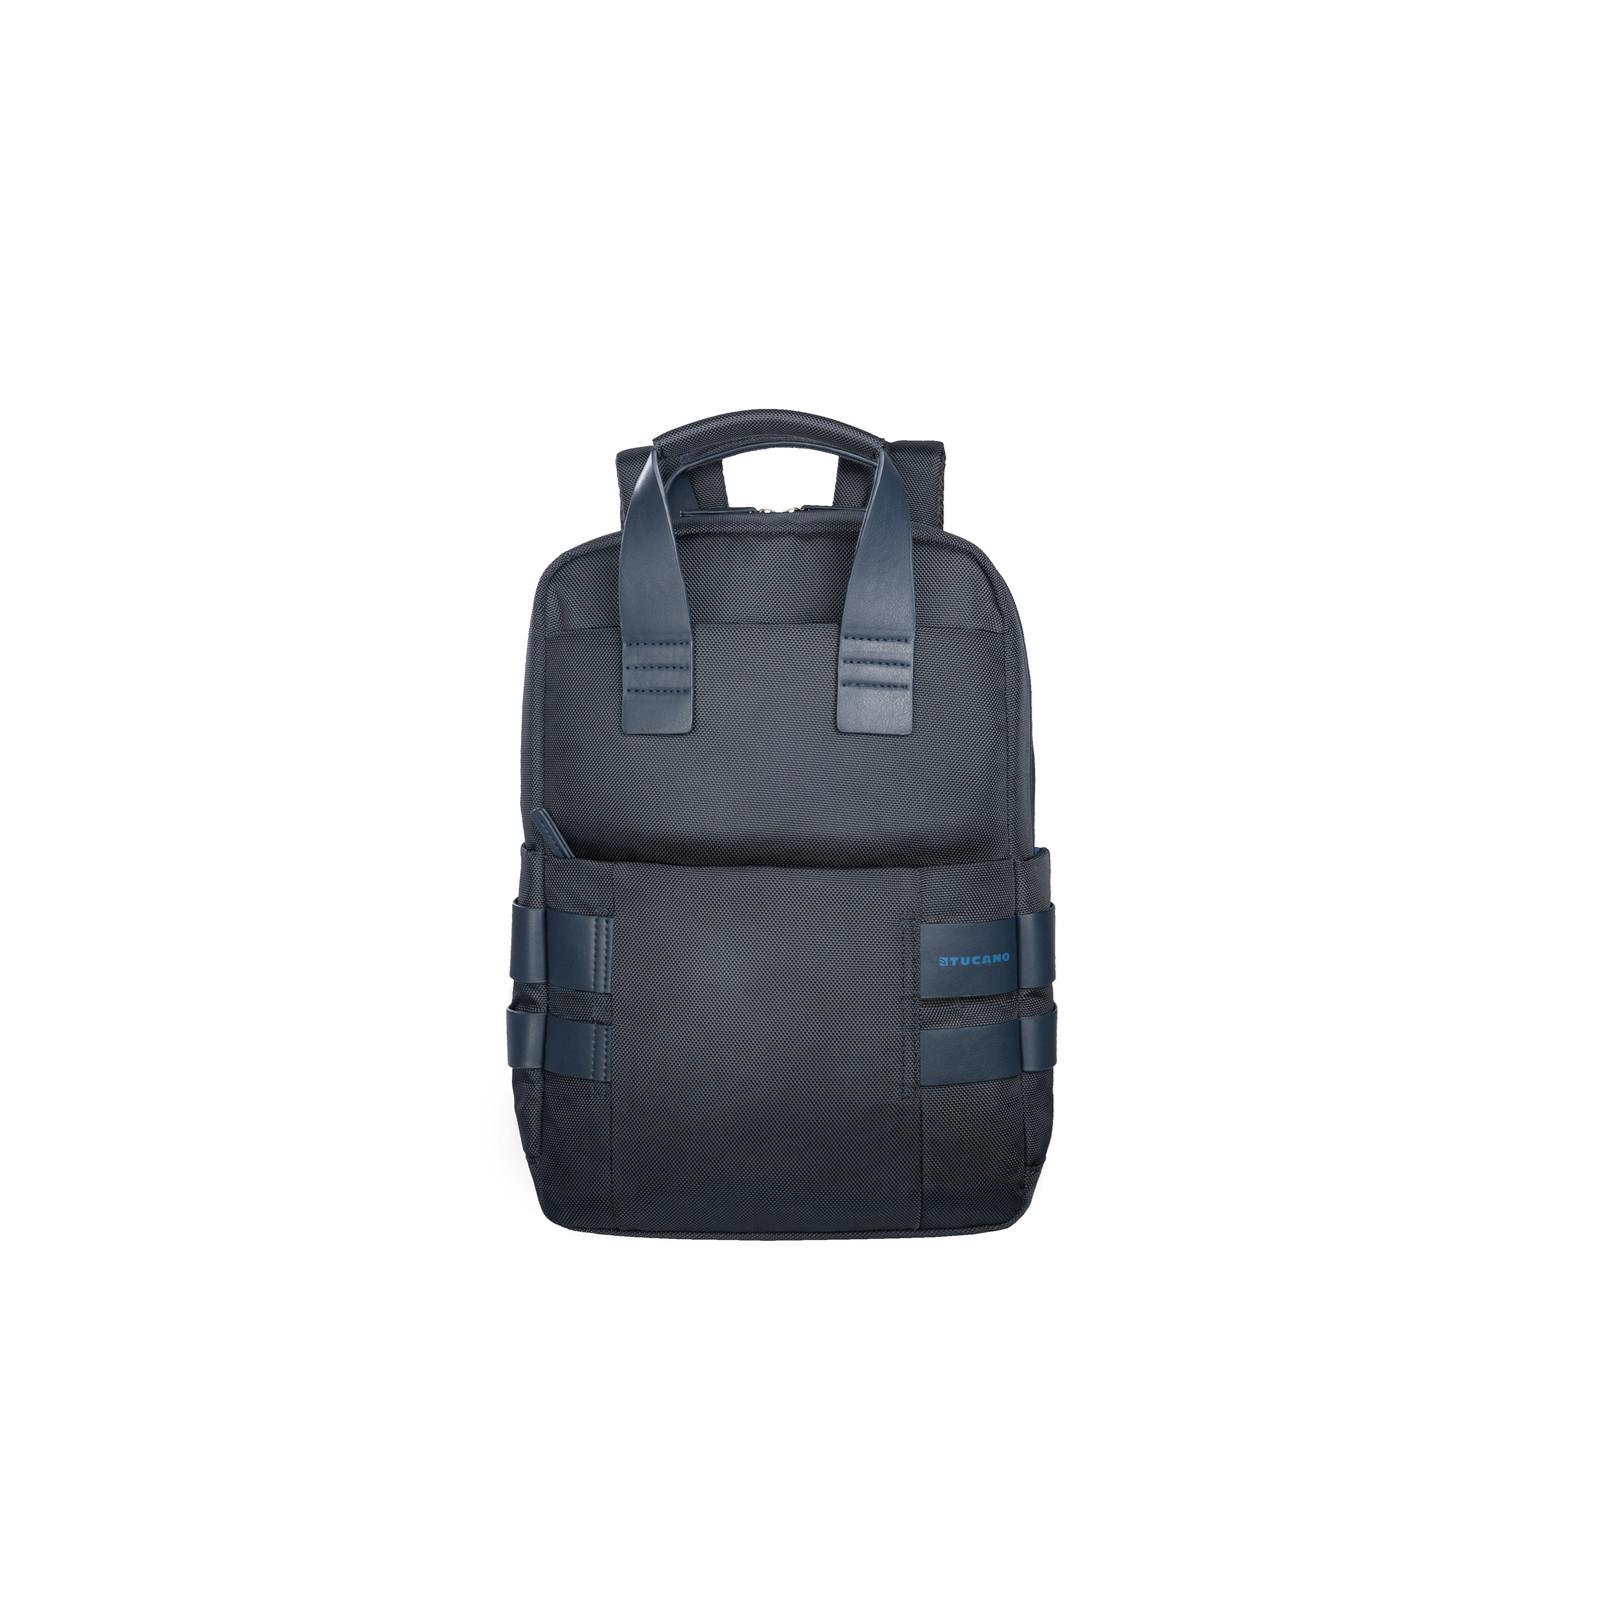 Tucano SUPER Backpack 13.3''-14'' laptop/13'' MacBook Pro, Dark Blu